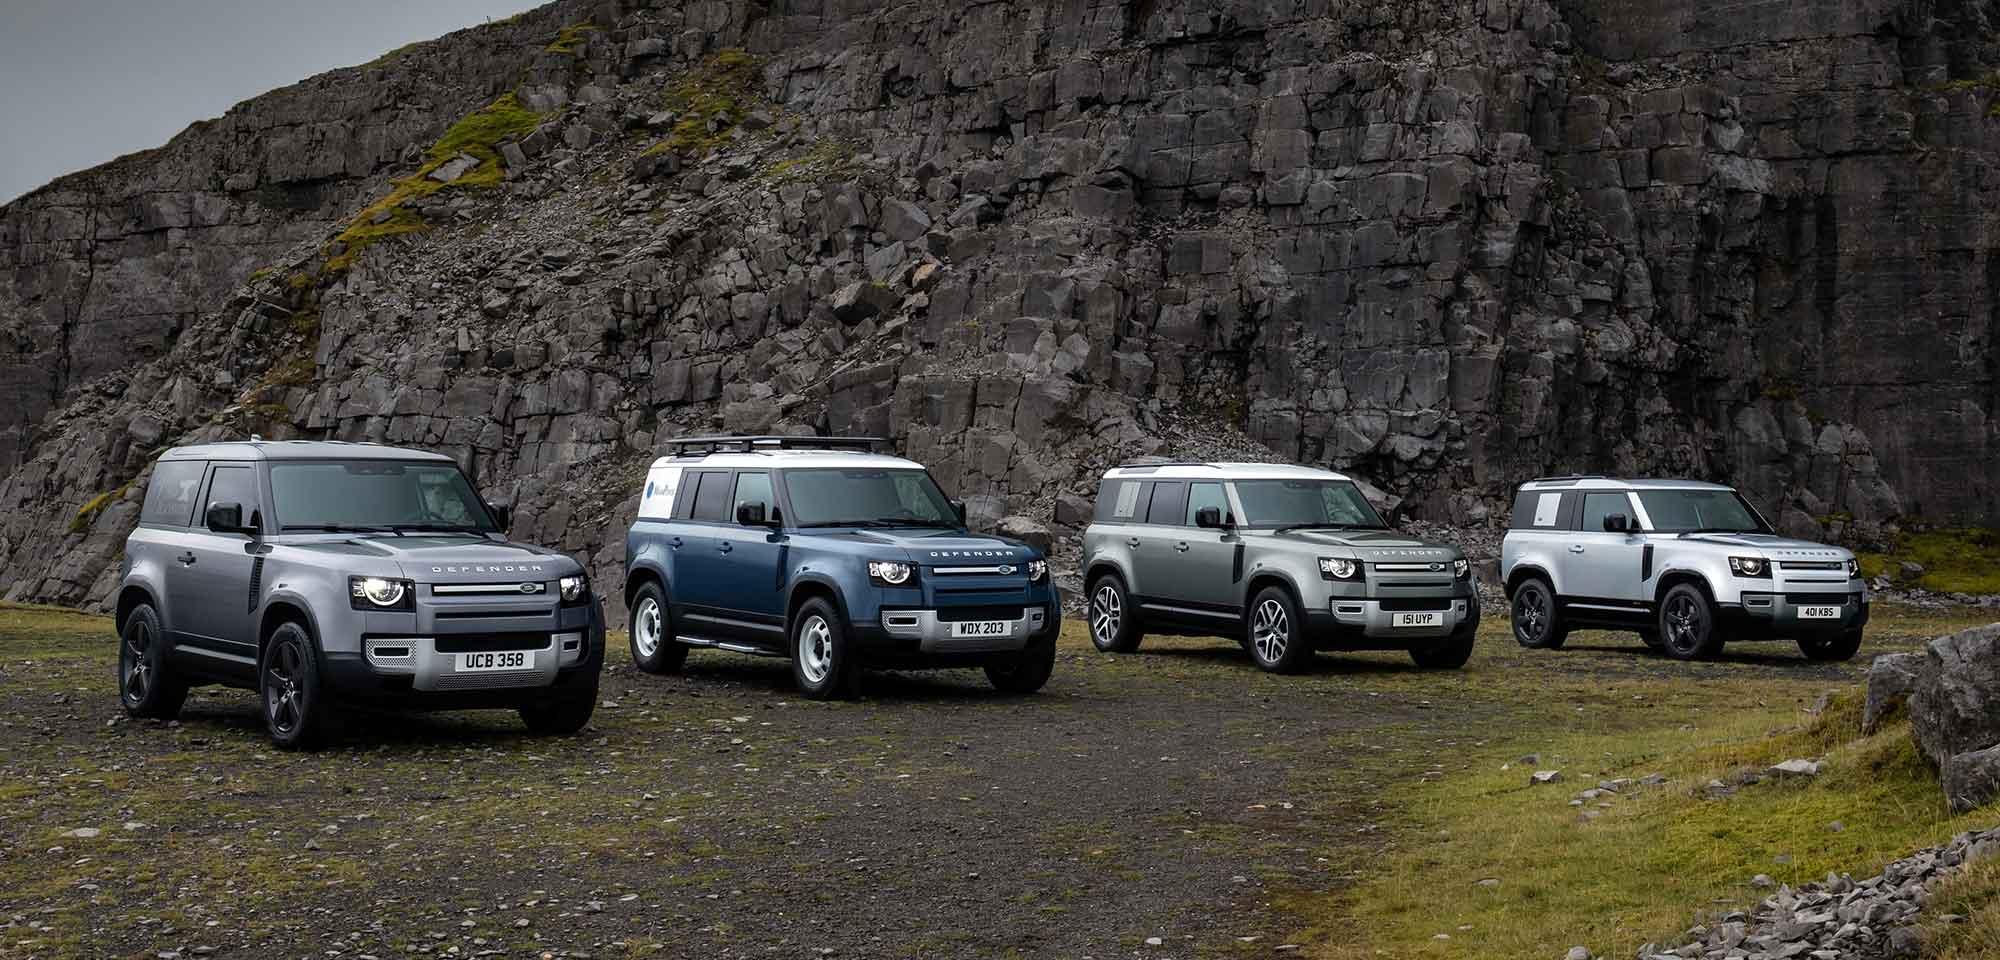 New Land Rover Defender family